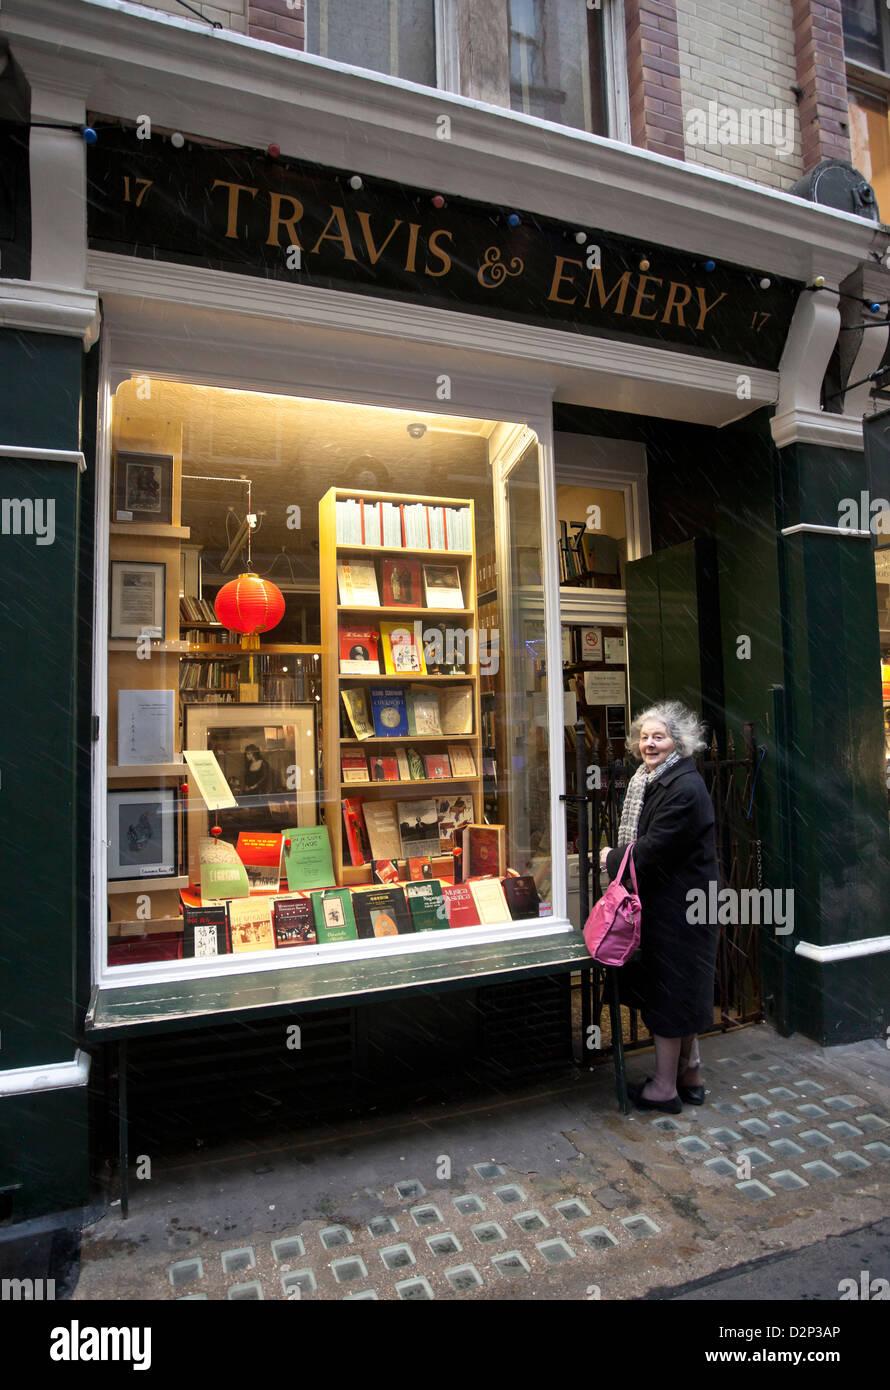 Travis & Emery Music Bookshop, 17 Cecil Court, Covent Garden, London, England, UK - Stock Image